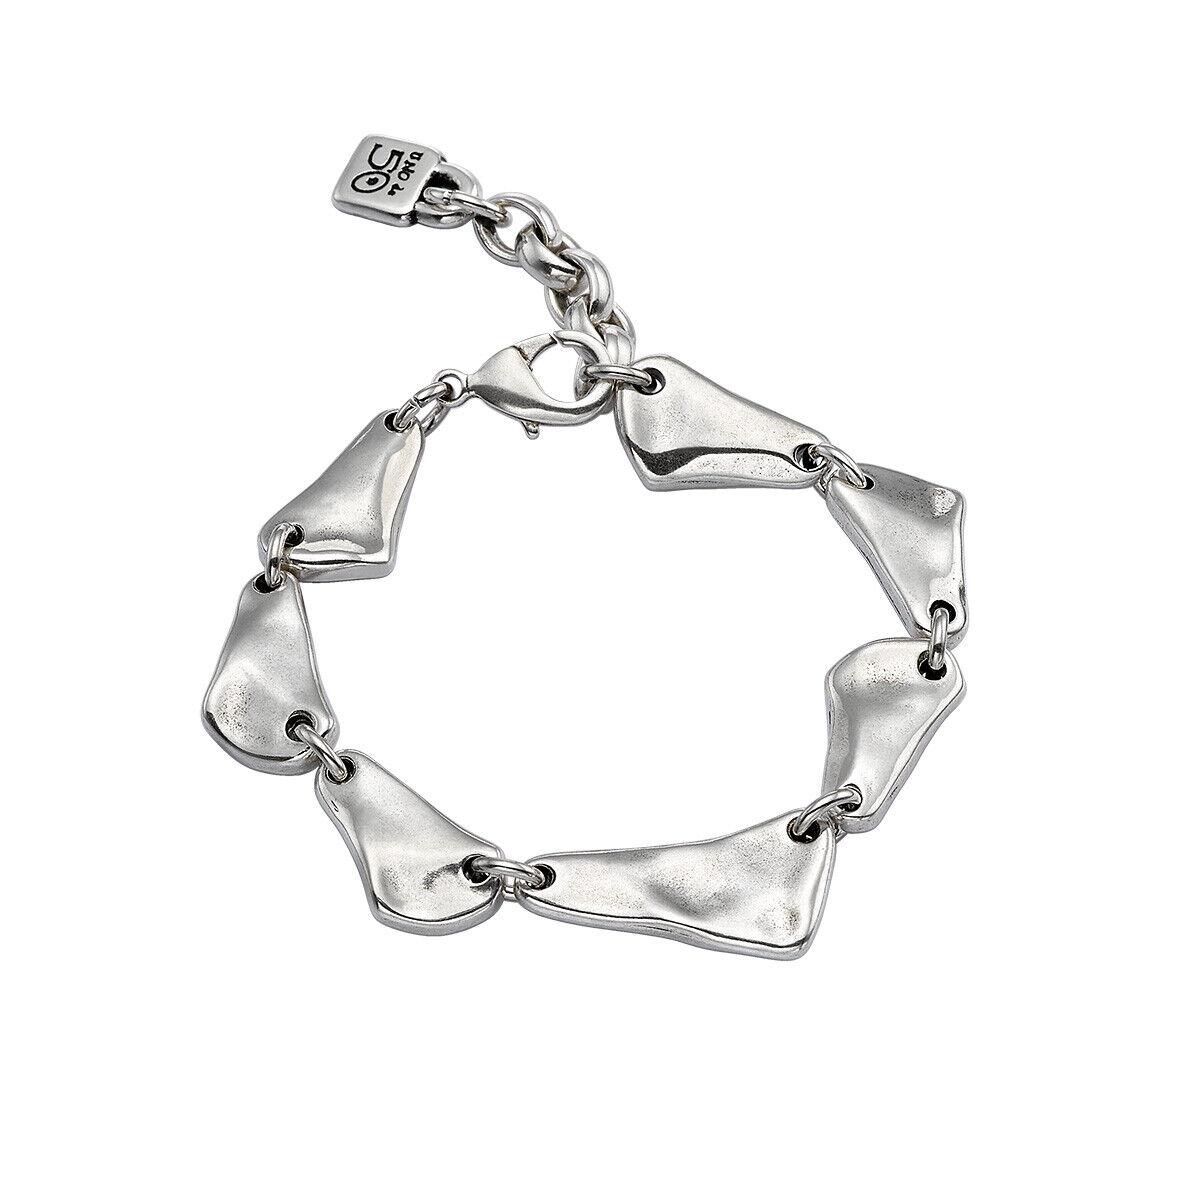 be sharp silver plated bracelet